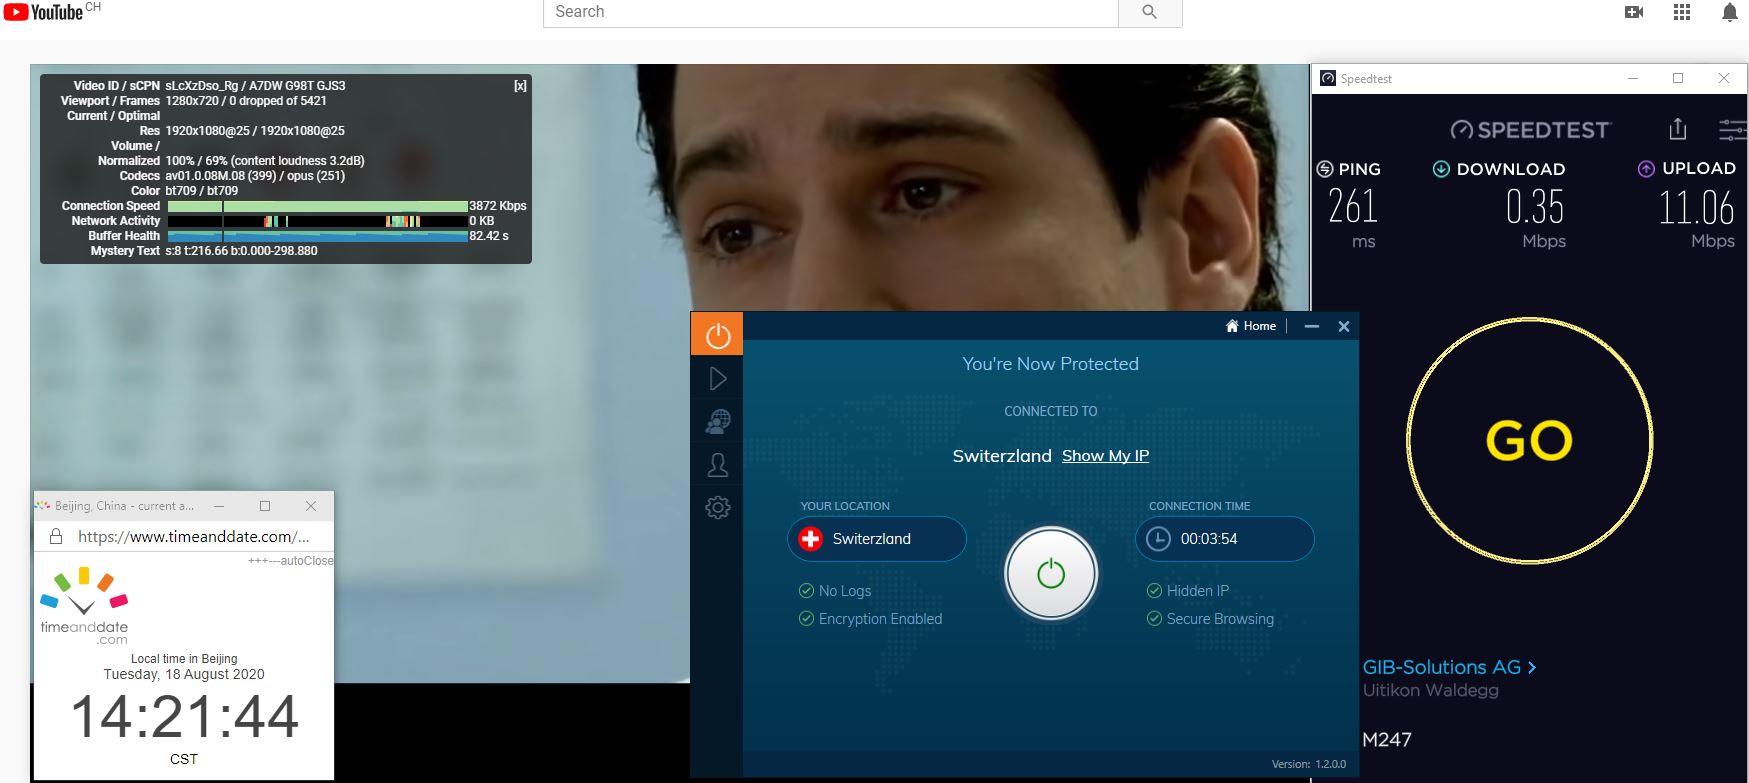 Windows10 IvacyVPN Switzerland 中国VPN 翻墙 科学上网 翻墙速度测试 - 20200818